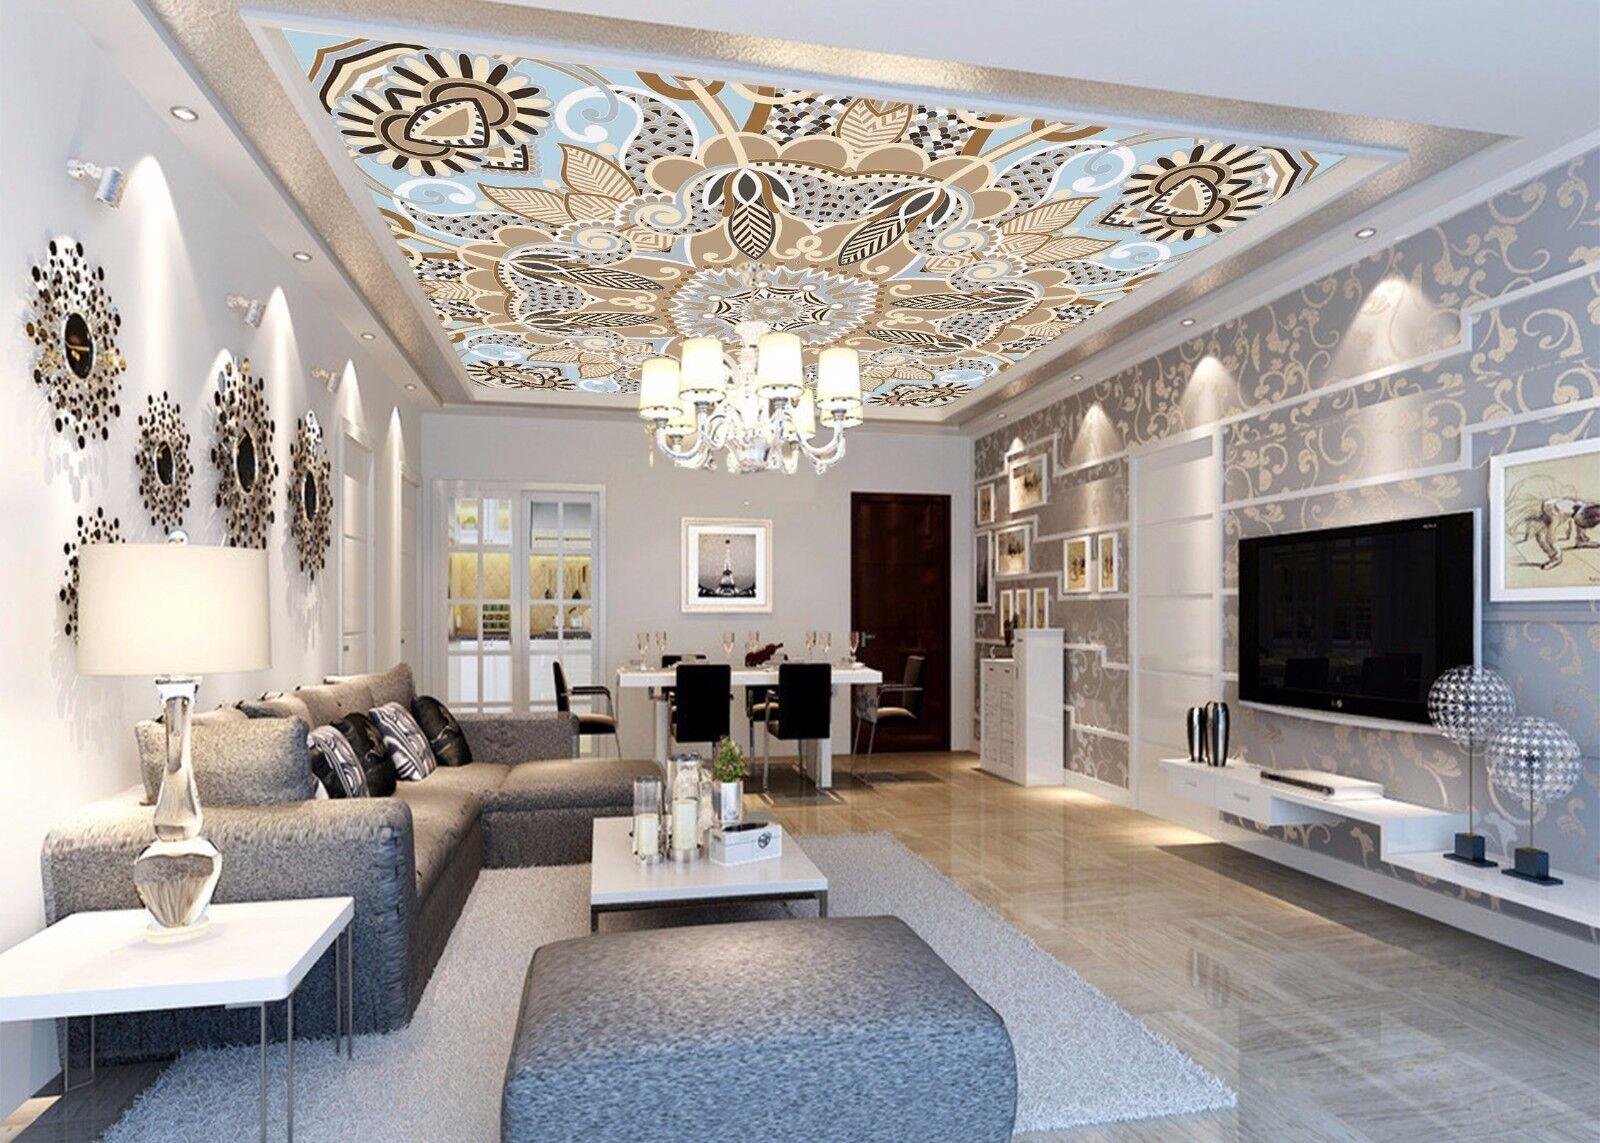 3D Warm Style 743 Ceiling WallPaper Murals Wall Print Decal Deco AJ WALLPAPER GB